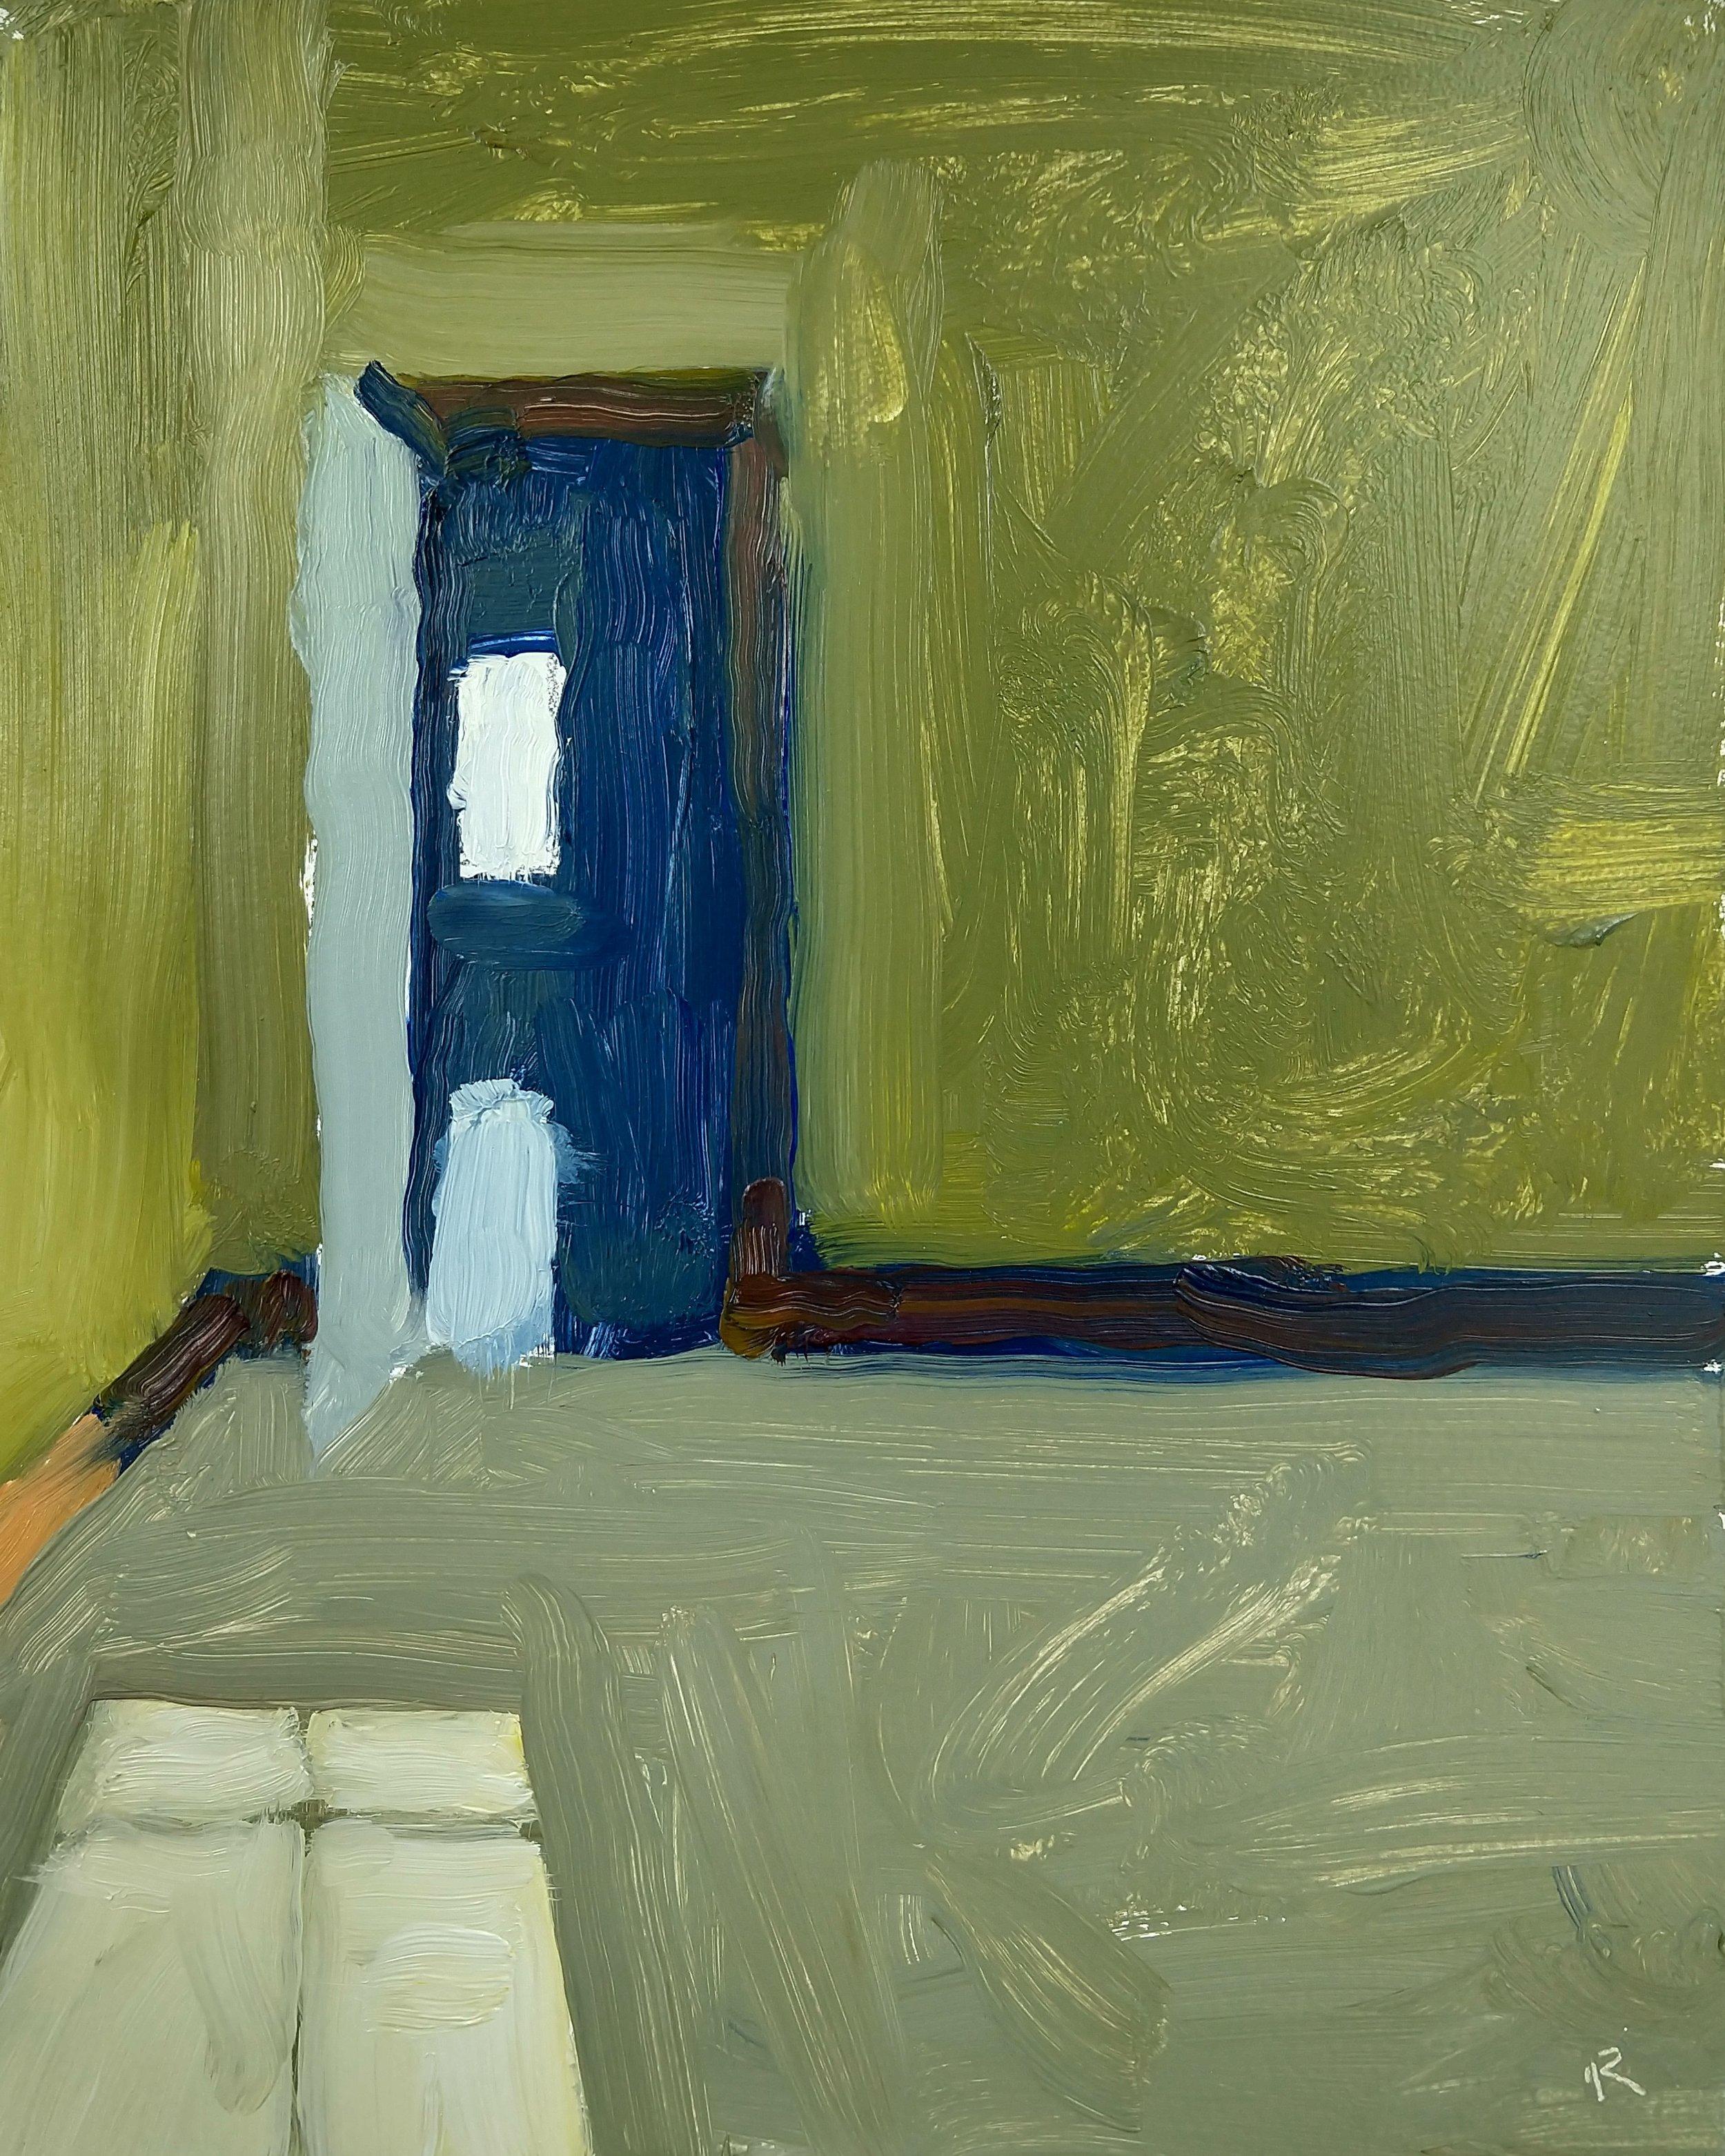 Interior w Window Light, Robert Ross, 10x8 in, oil.jpg